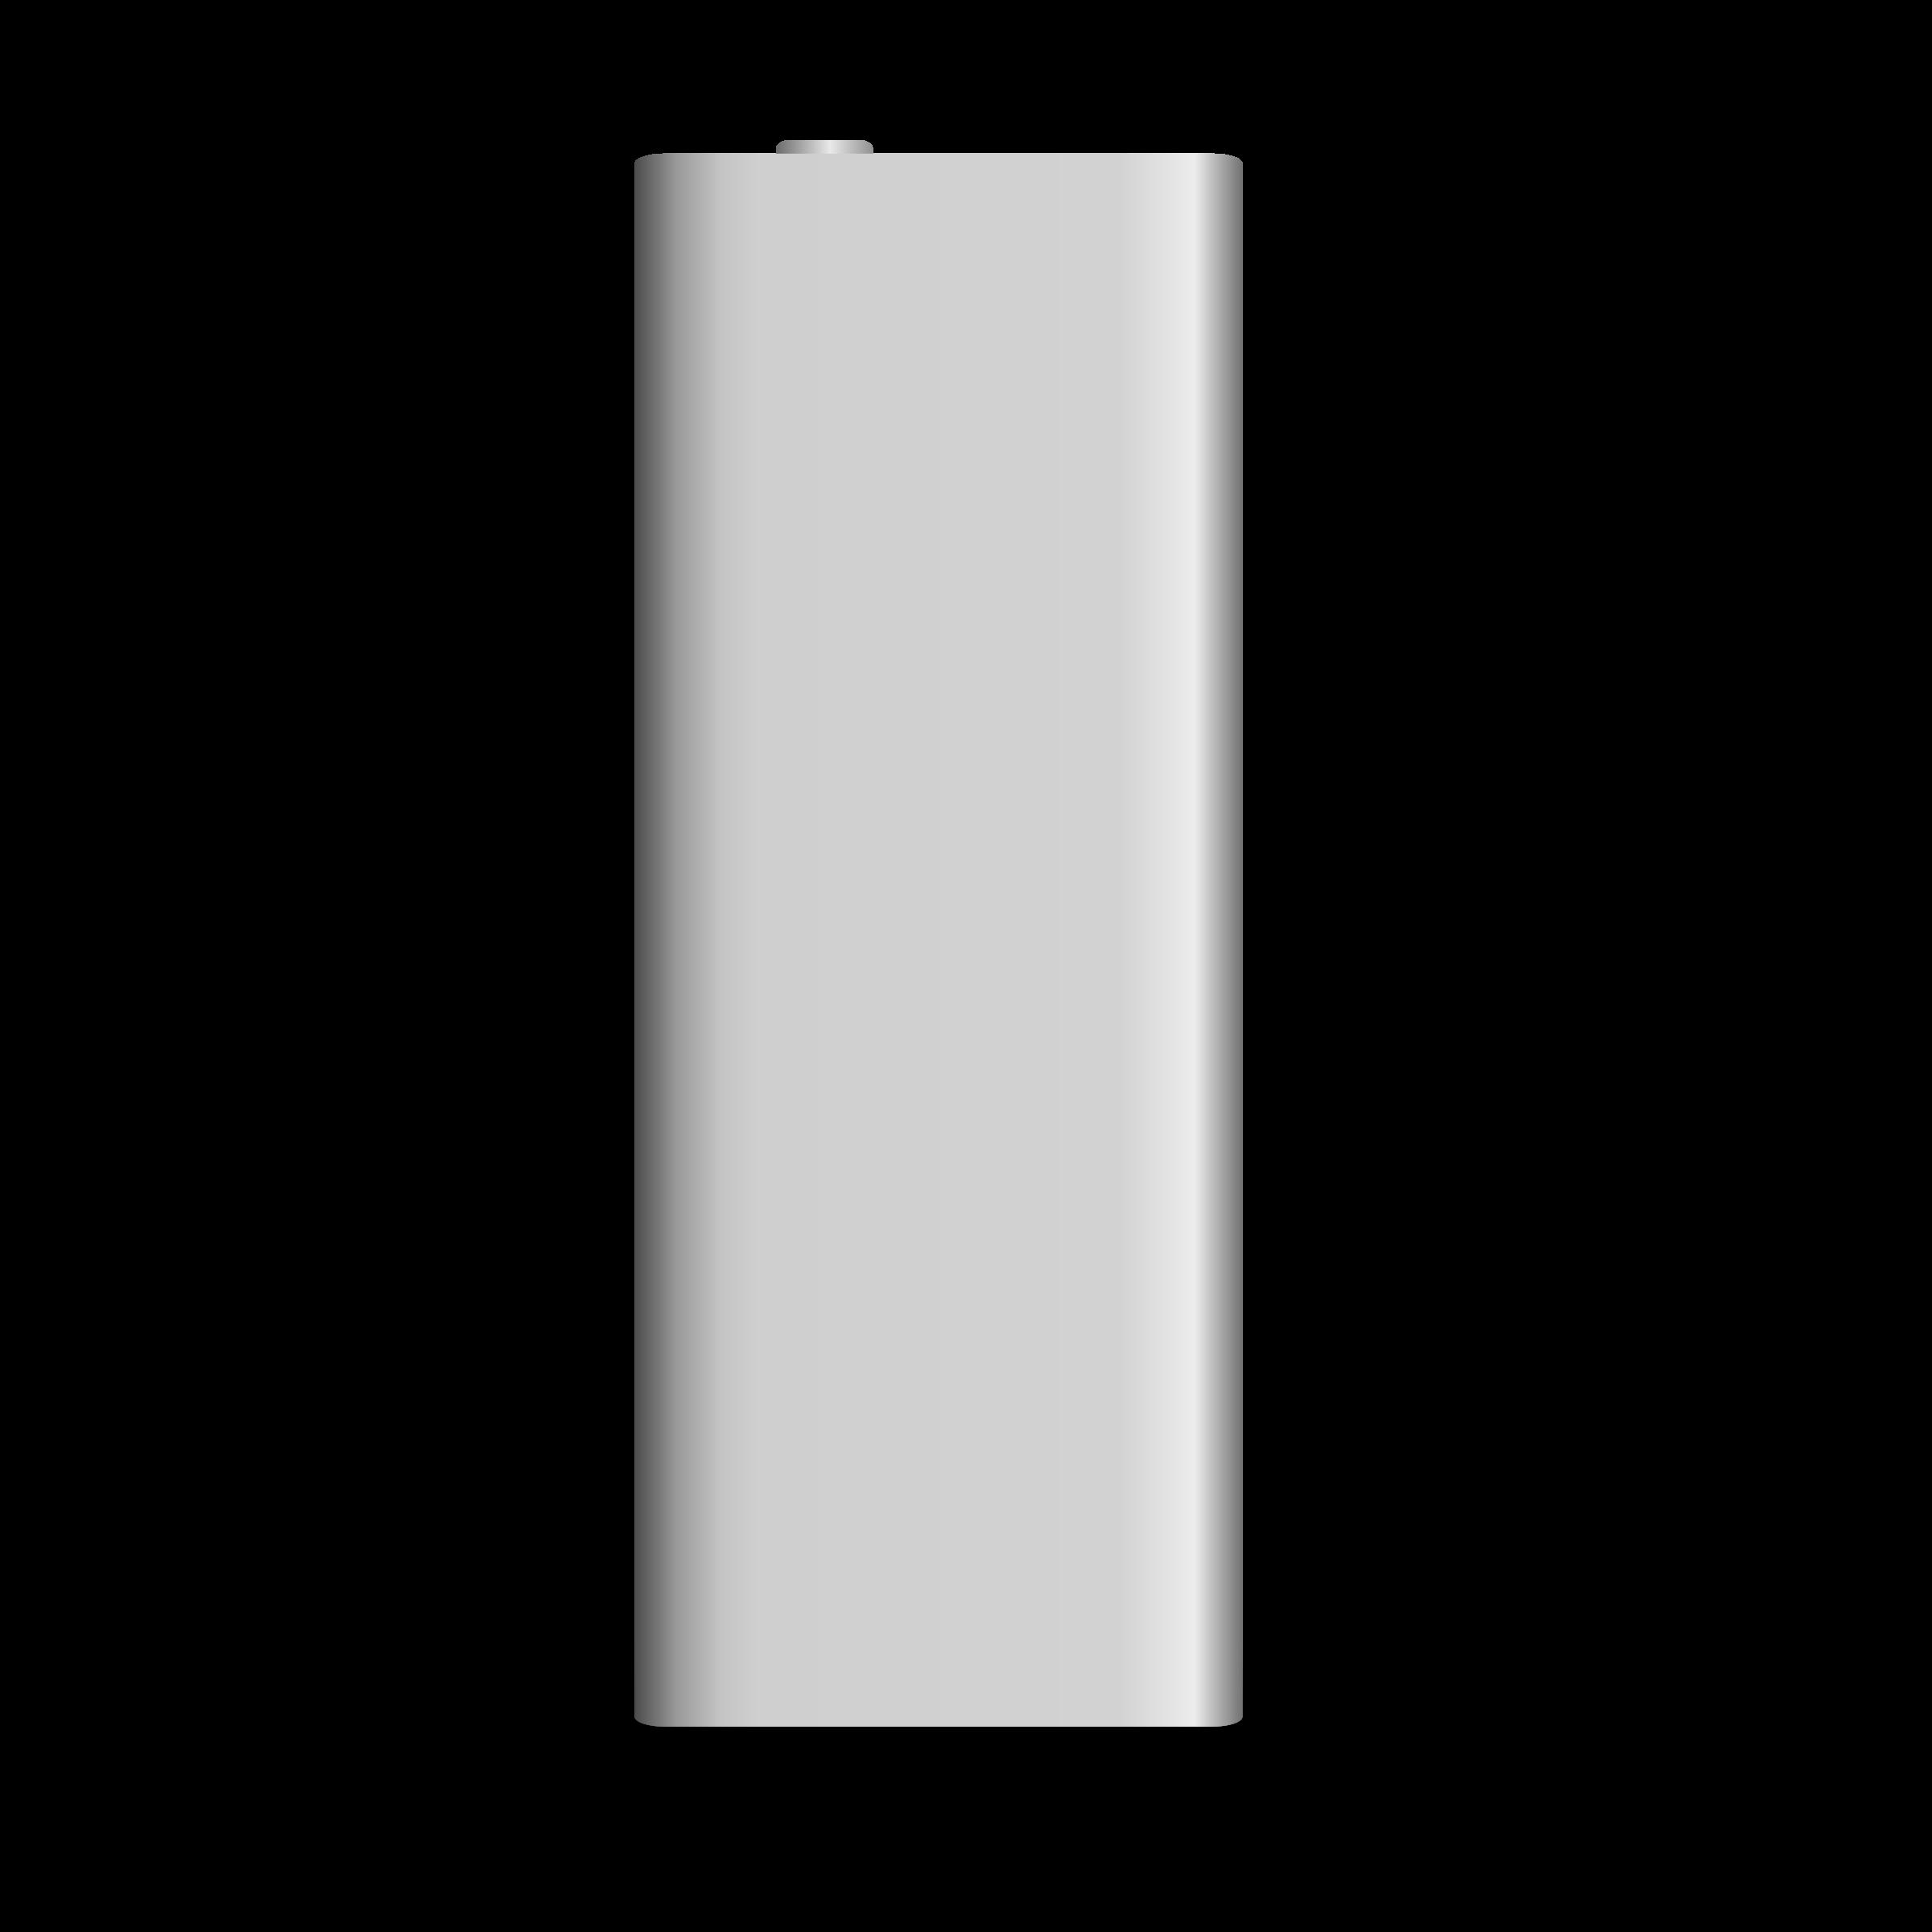 Ipod Shuffle Clipart.